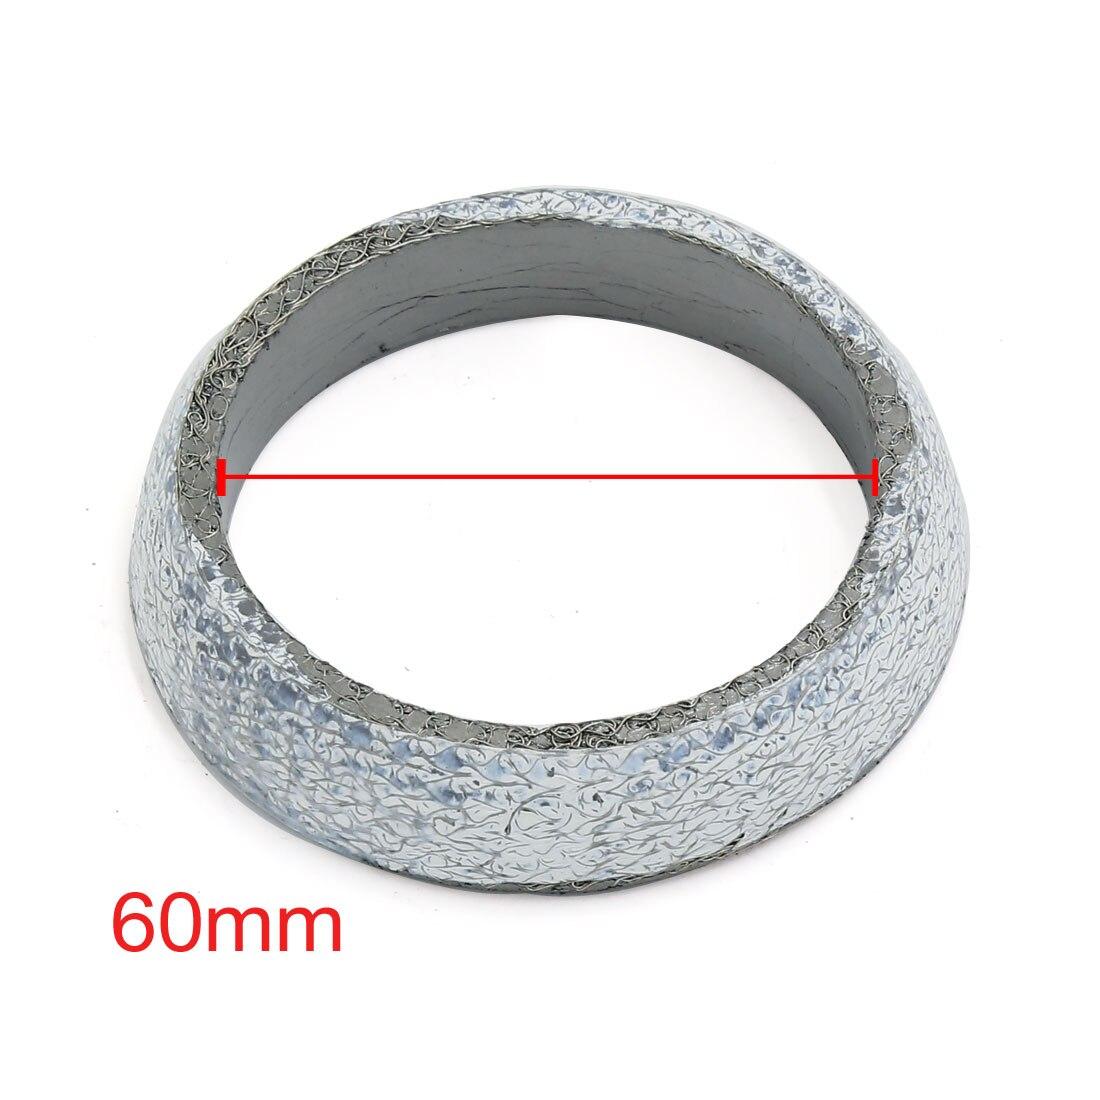 60mm HEADER//MANIFOLD//DOWNPIPE EXHAUST FLANGE WELD-ON GRAPHITE DONUT GASKET